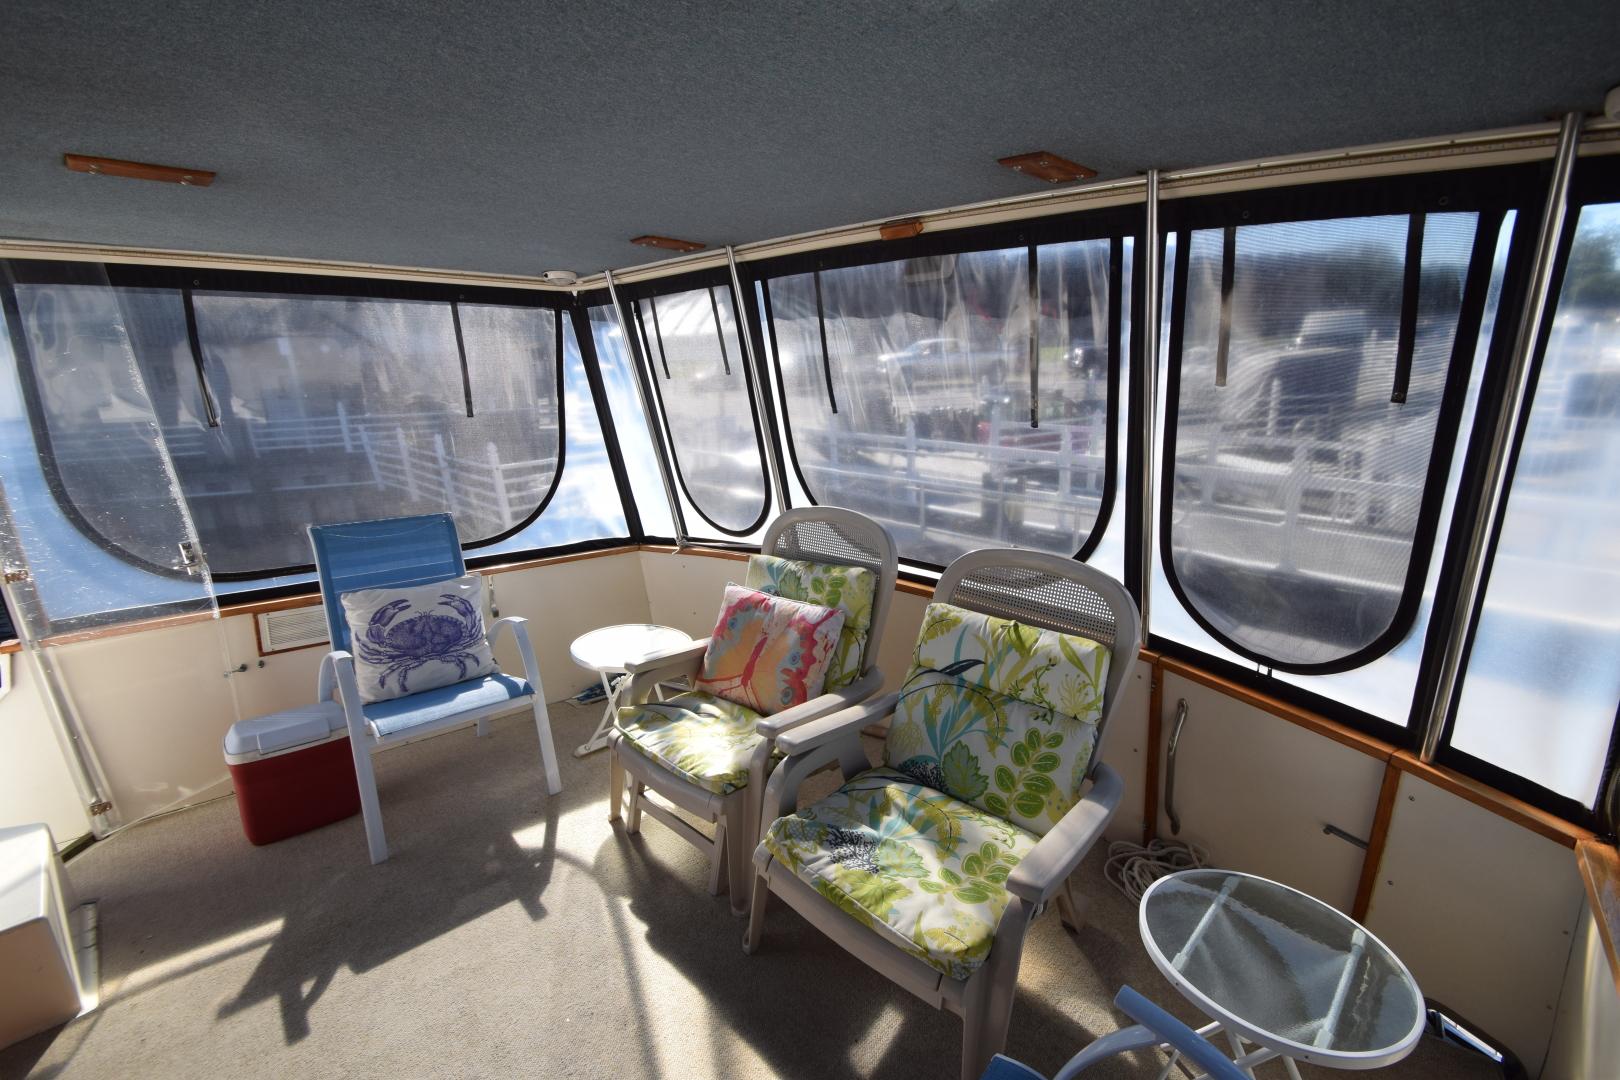 Ocean Yachts-46 Sunliner 1986-Sugah Portsmouth-Virginia-United States-1555500 | Thumbnail